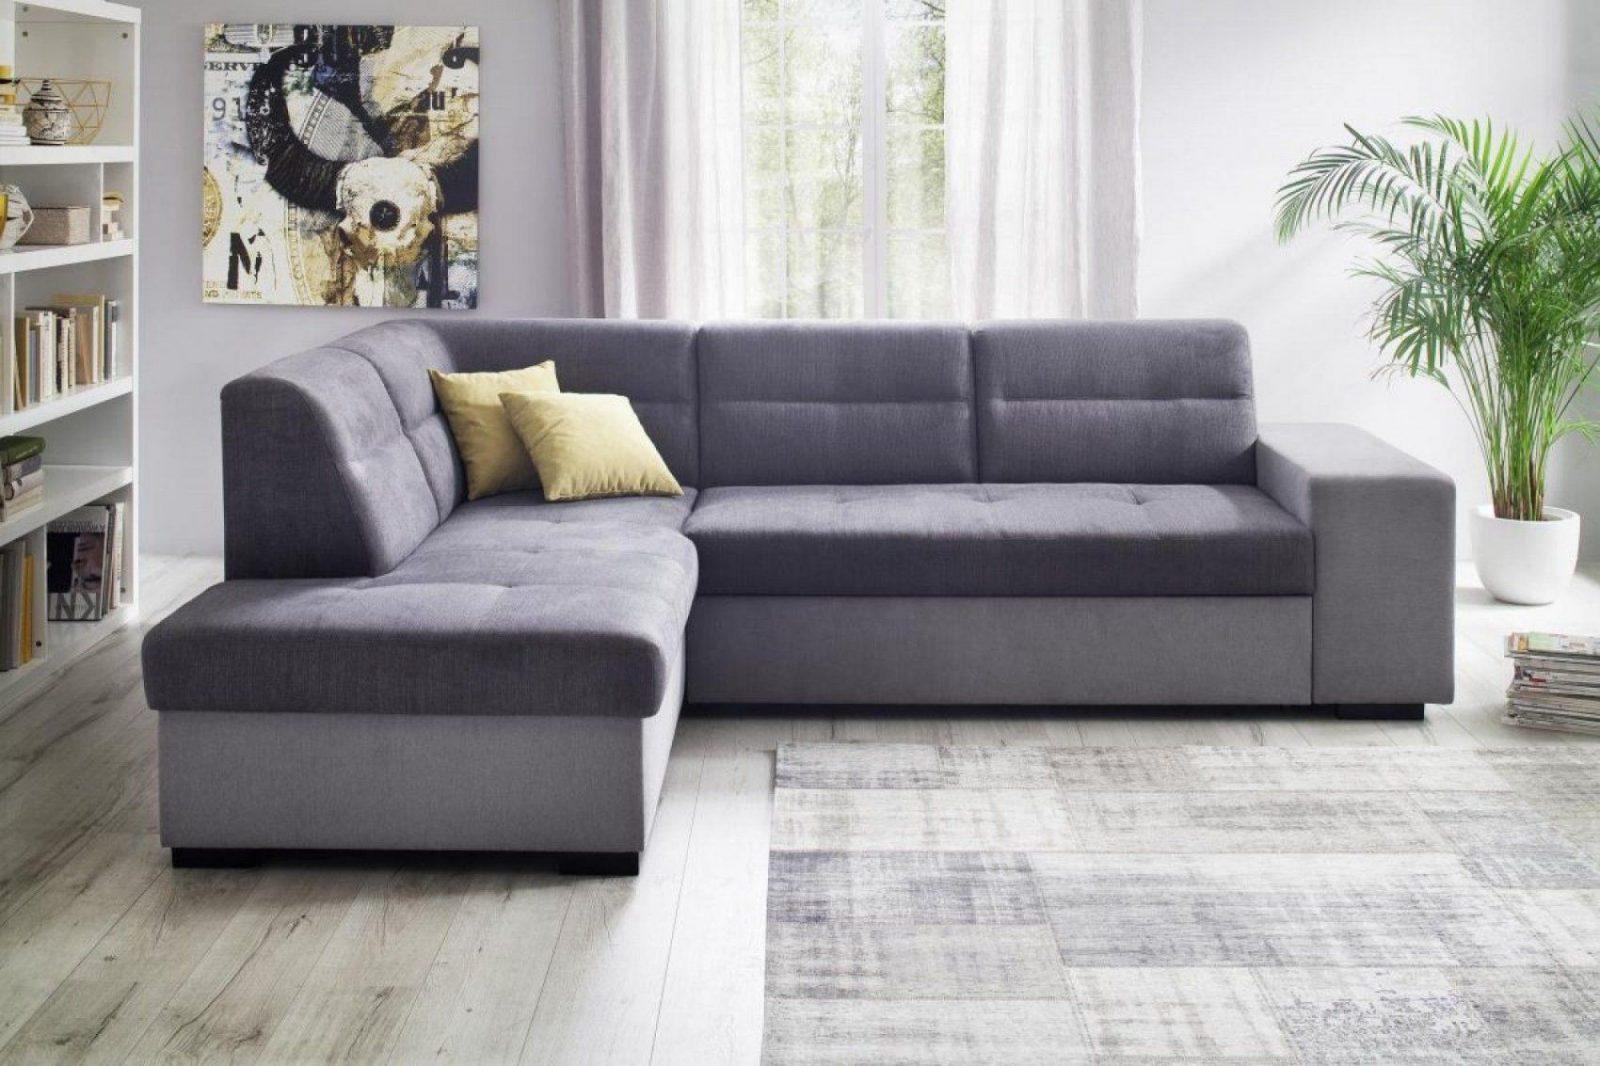 3 Sitzer Sofa Poco Couch Poco Cool Big Couch Poco Sofa Sofas Xxl Ga von 3 Sitzer Sofa Poco Photo